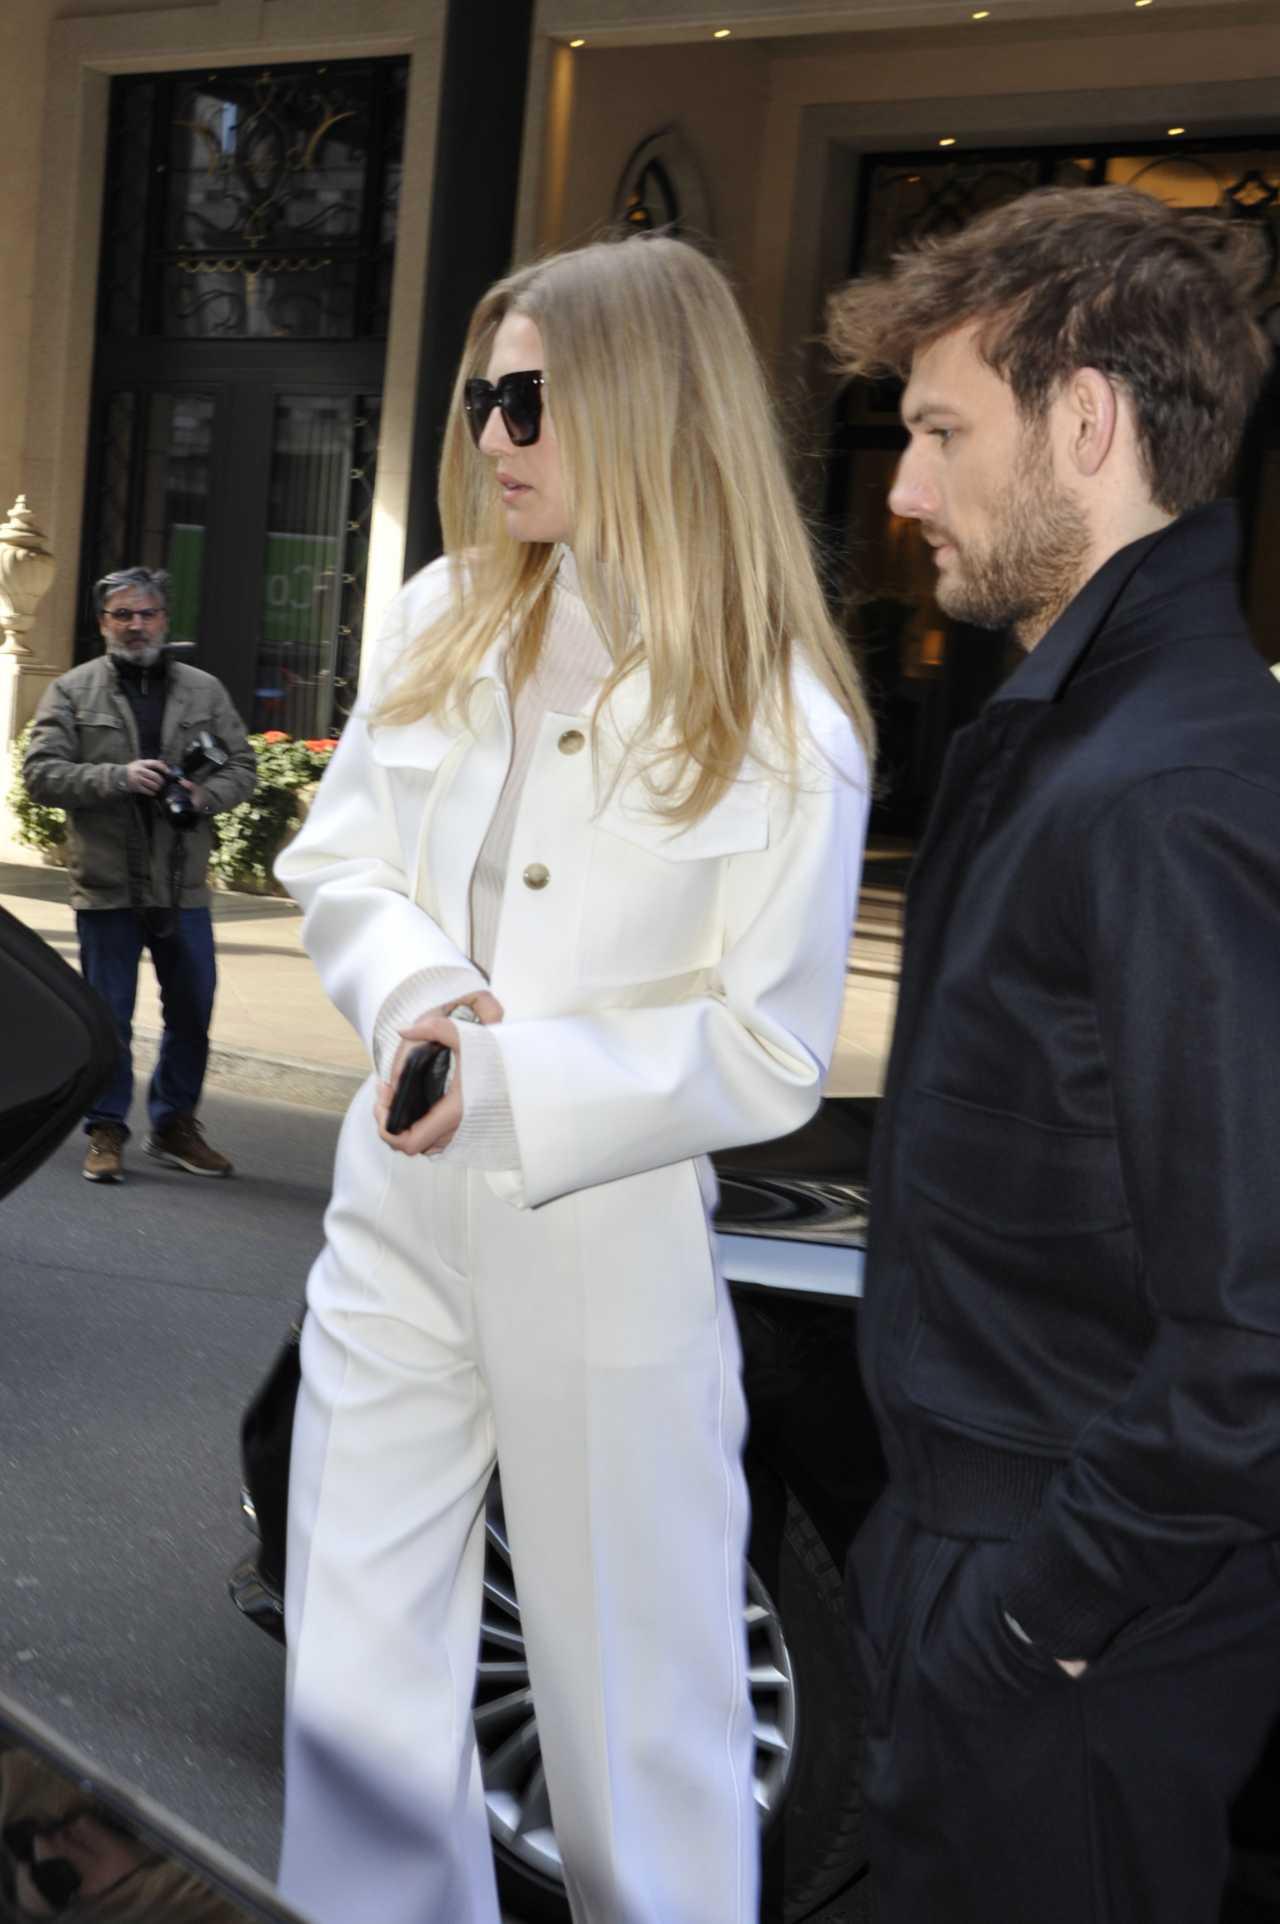 Toni Garrn 2020 : Toni Garrn with Alex Pettyfer – Candids at Hotel in Milan-12